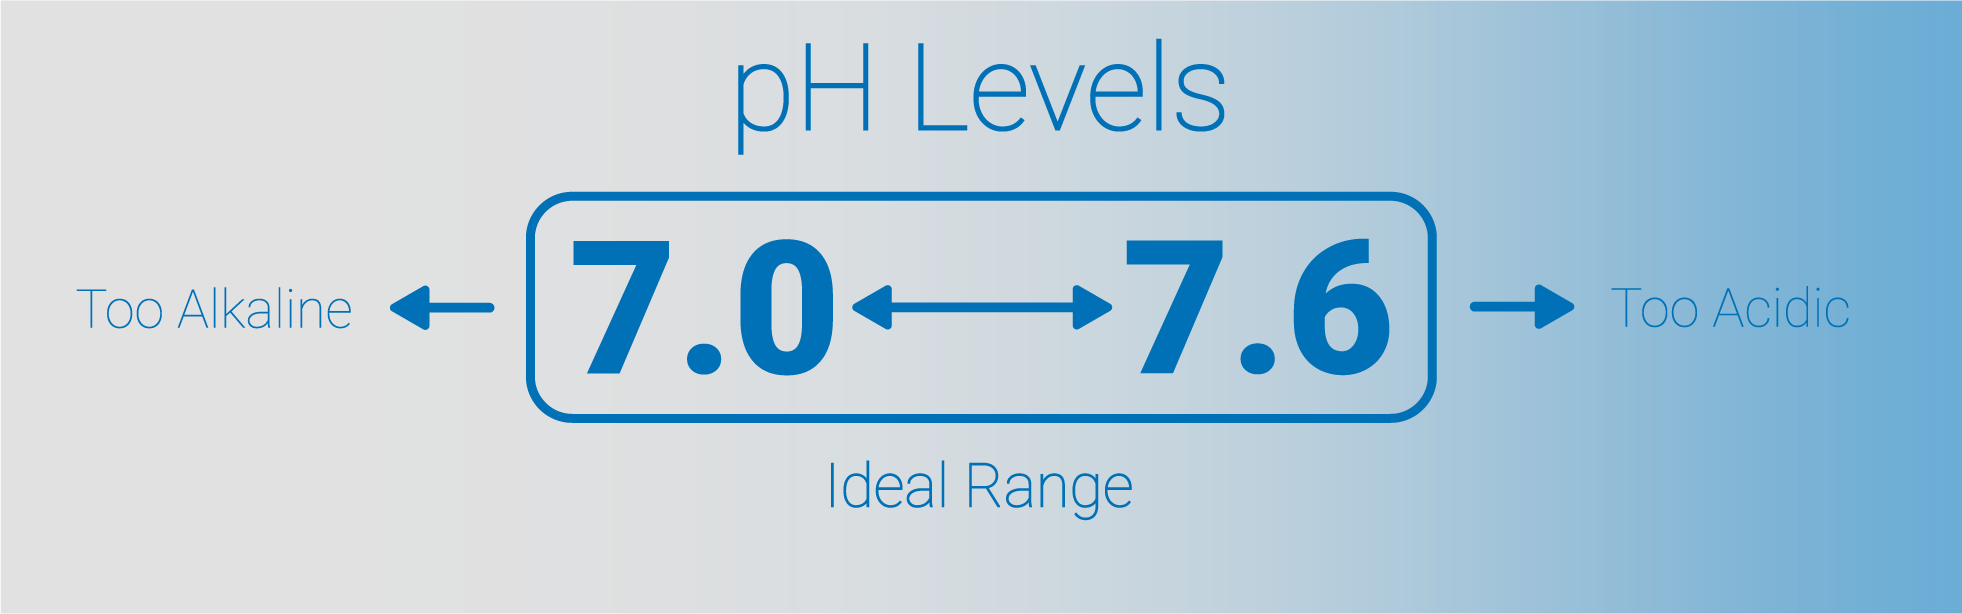 ph-levels